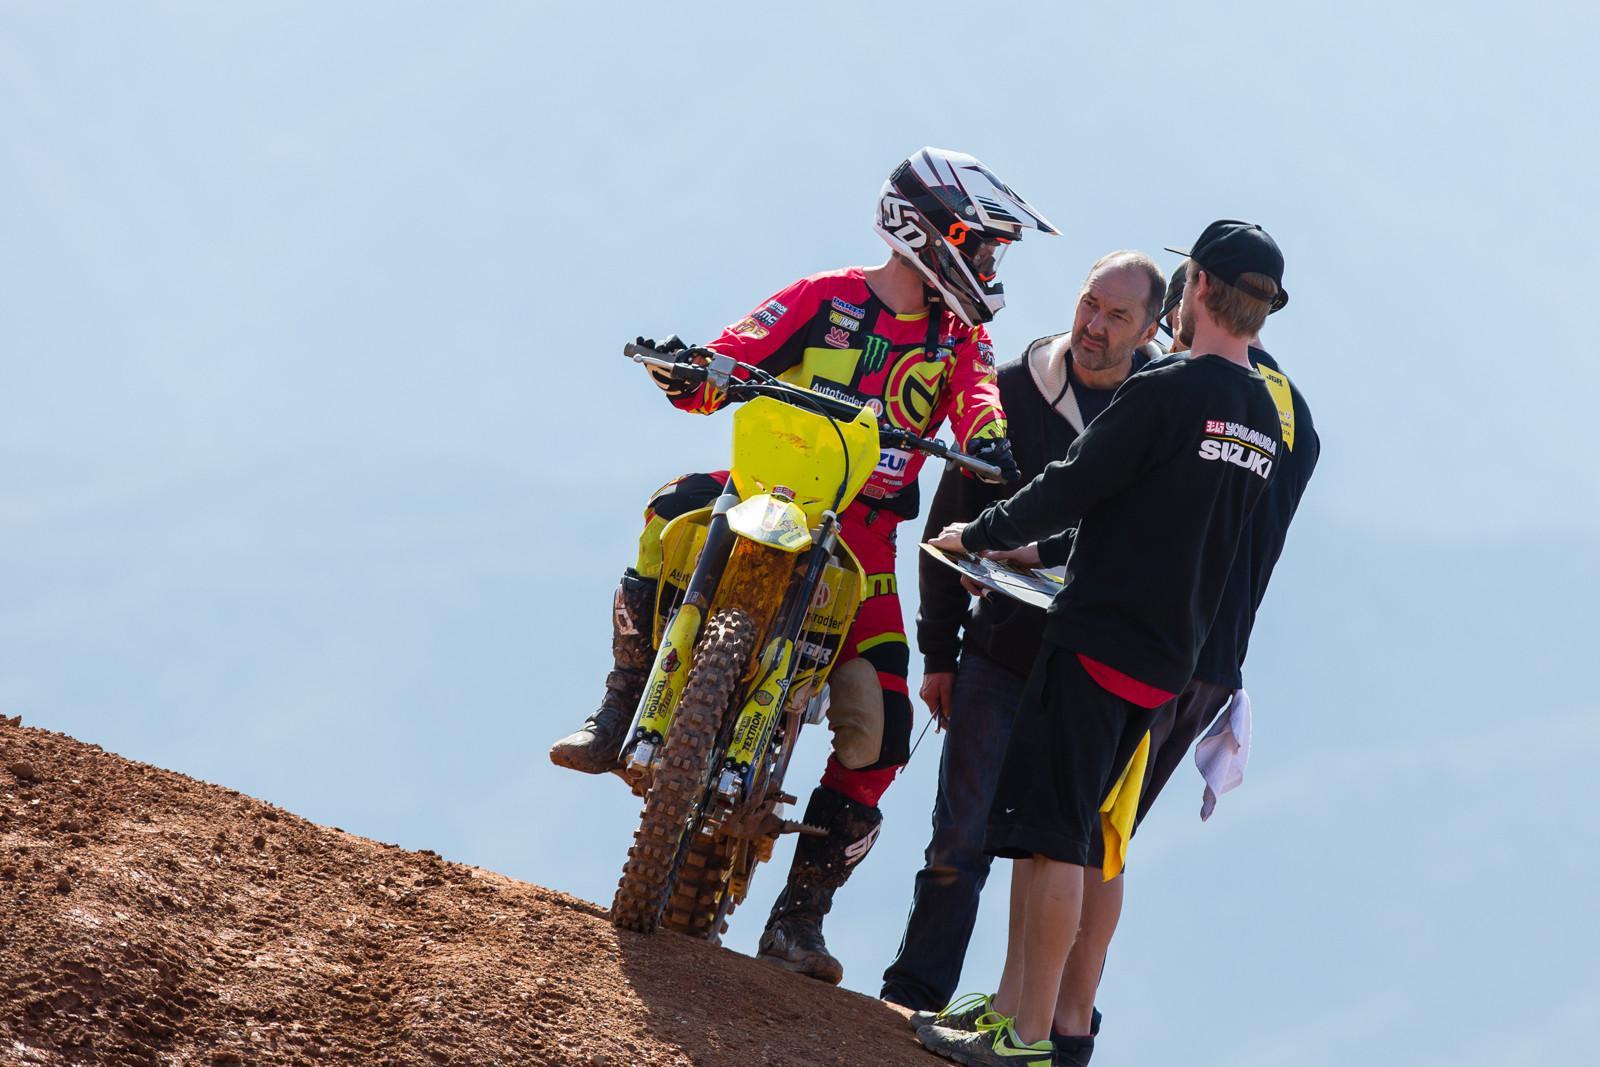 Phil Nicoletti - Supercross 2017: Prepping for Oakland - Motocross Pictures - Vital MX